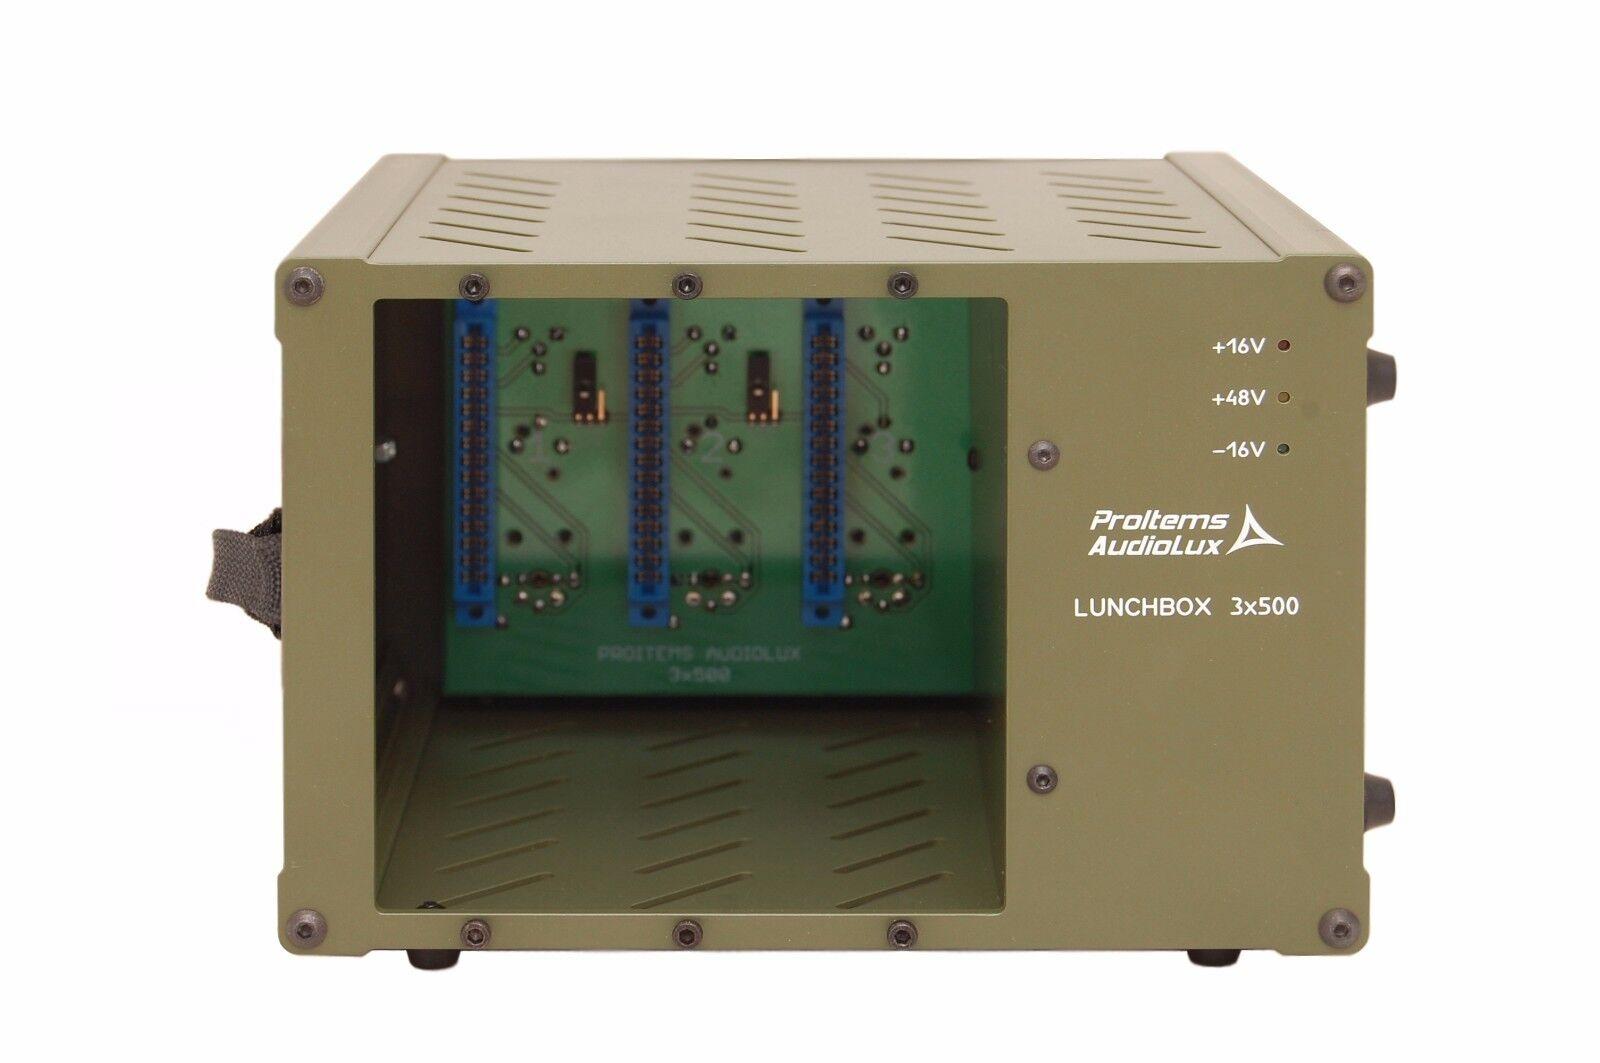 ProItems Audiolux 3X500 Lunchbox schwarz Handle